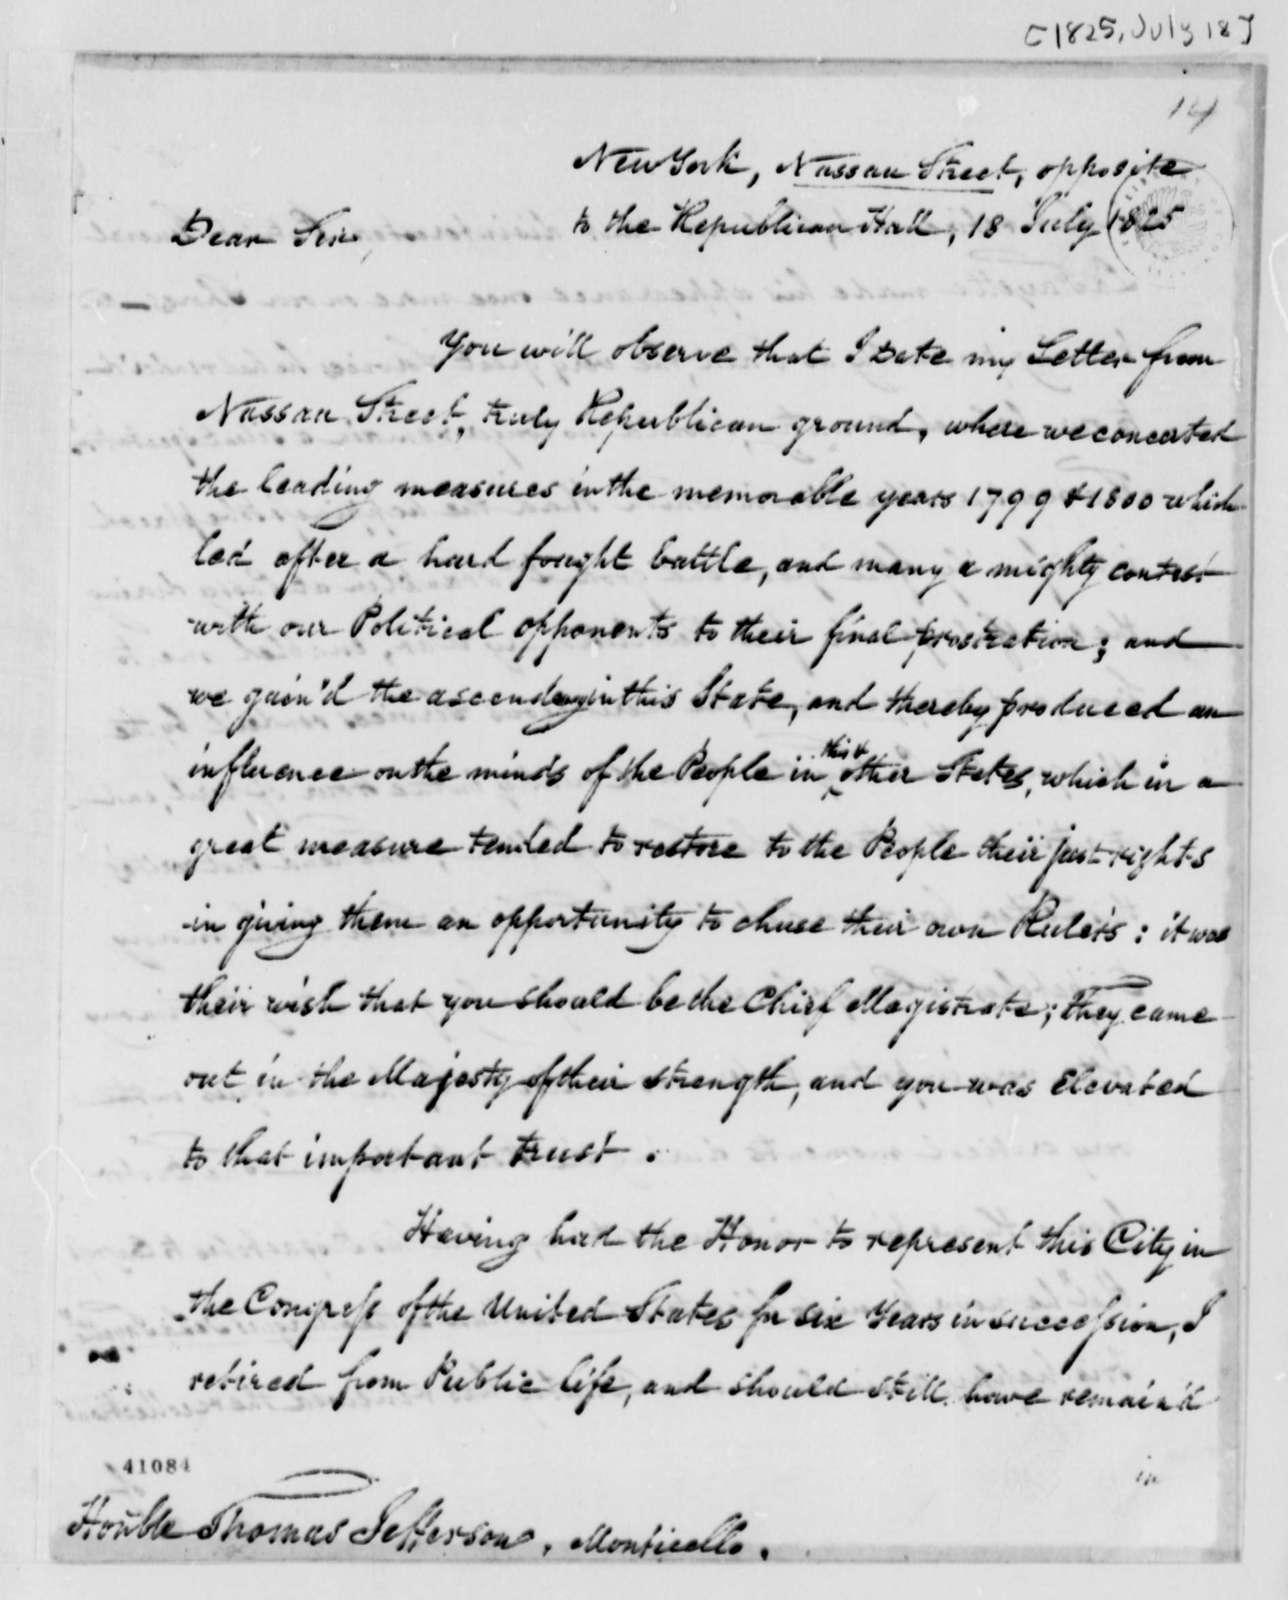 Gurdon S. Mumford to Thomas Jefferson, July 18, 1825